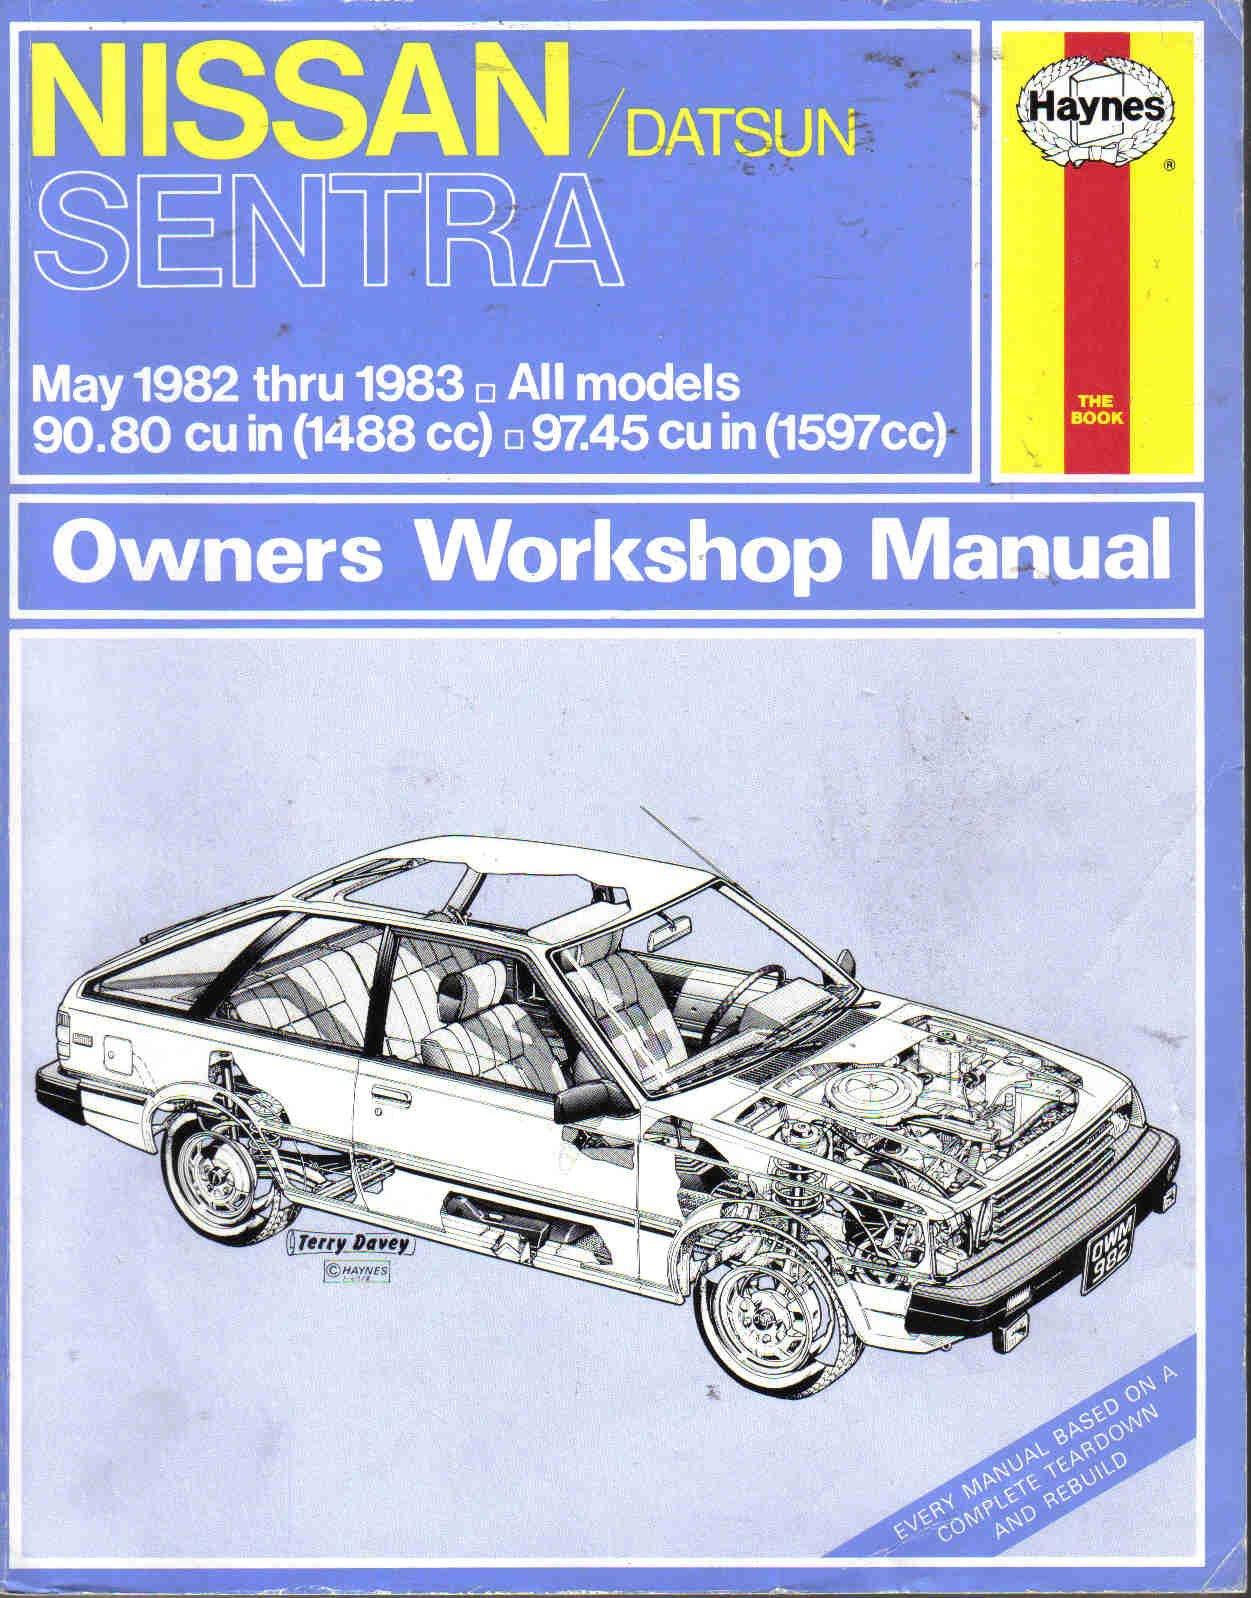 Nissan Sentra Service Manual: Exterior